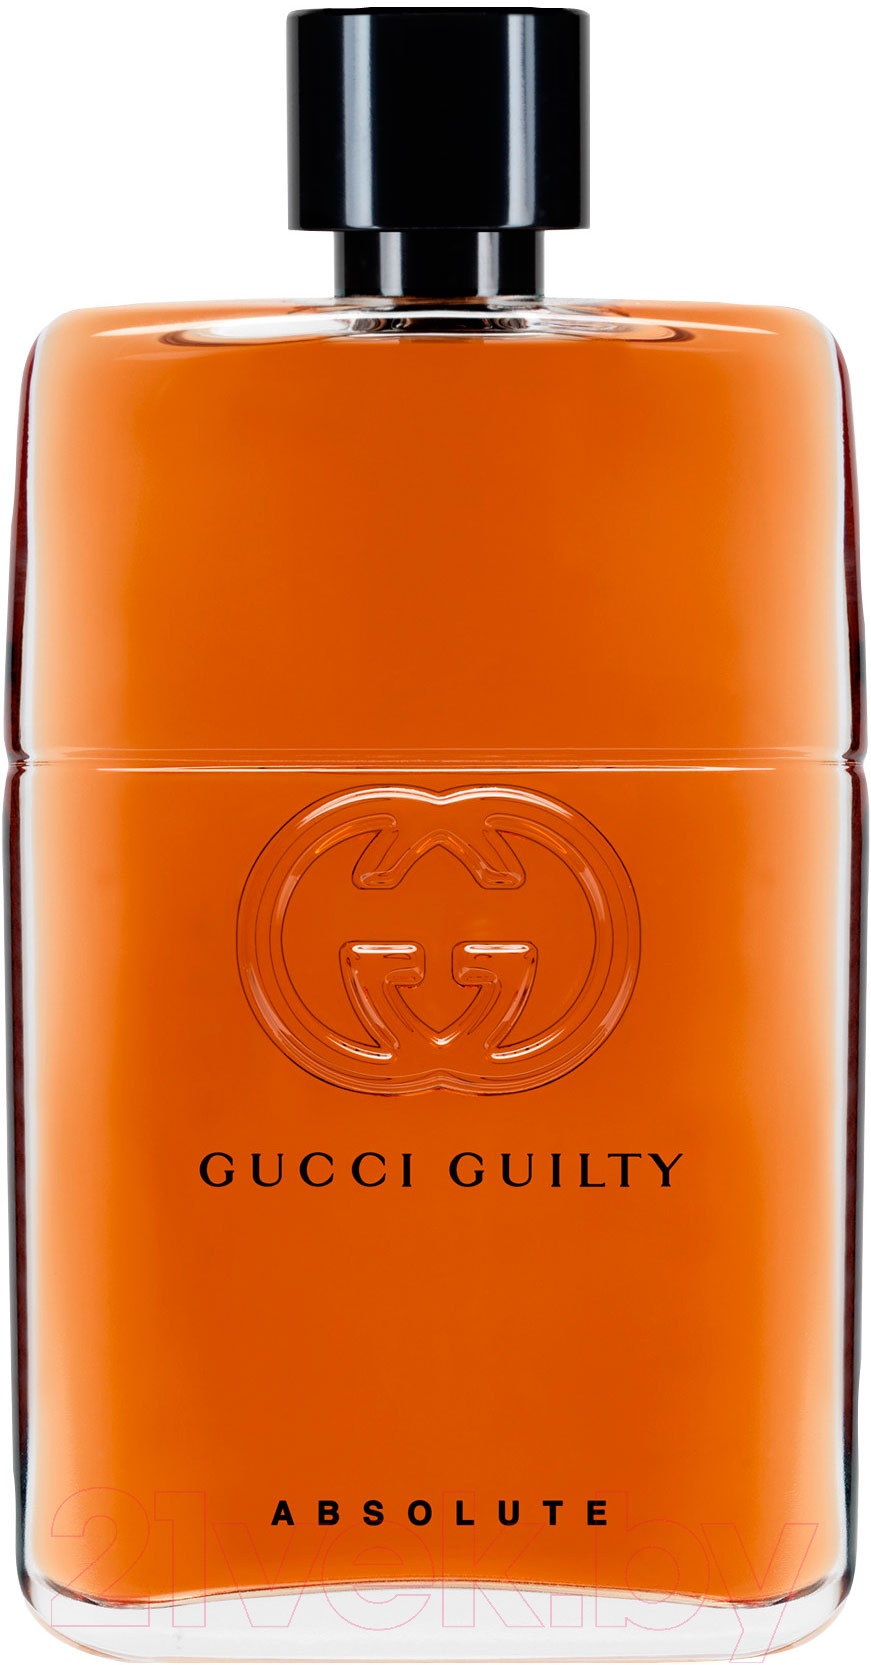 Купить Парфюмерная вода Gucci, Guilty Absolute Pour Homme (90мл), Швейцария, Guilty (Gucci)